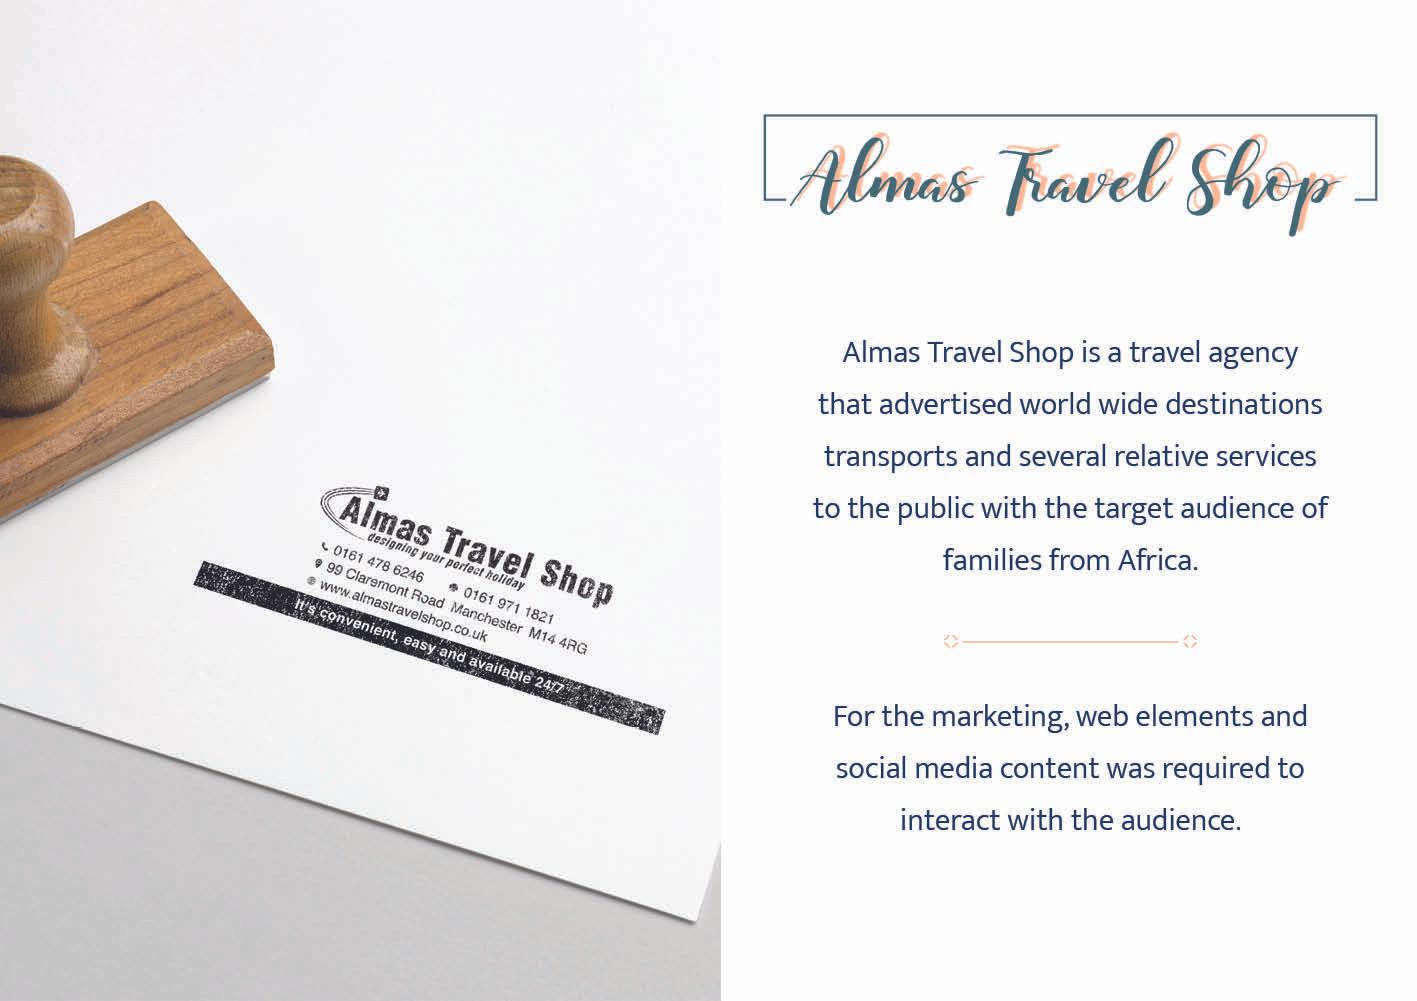 Almas Travel Shop